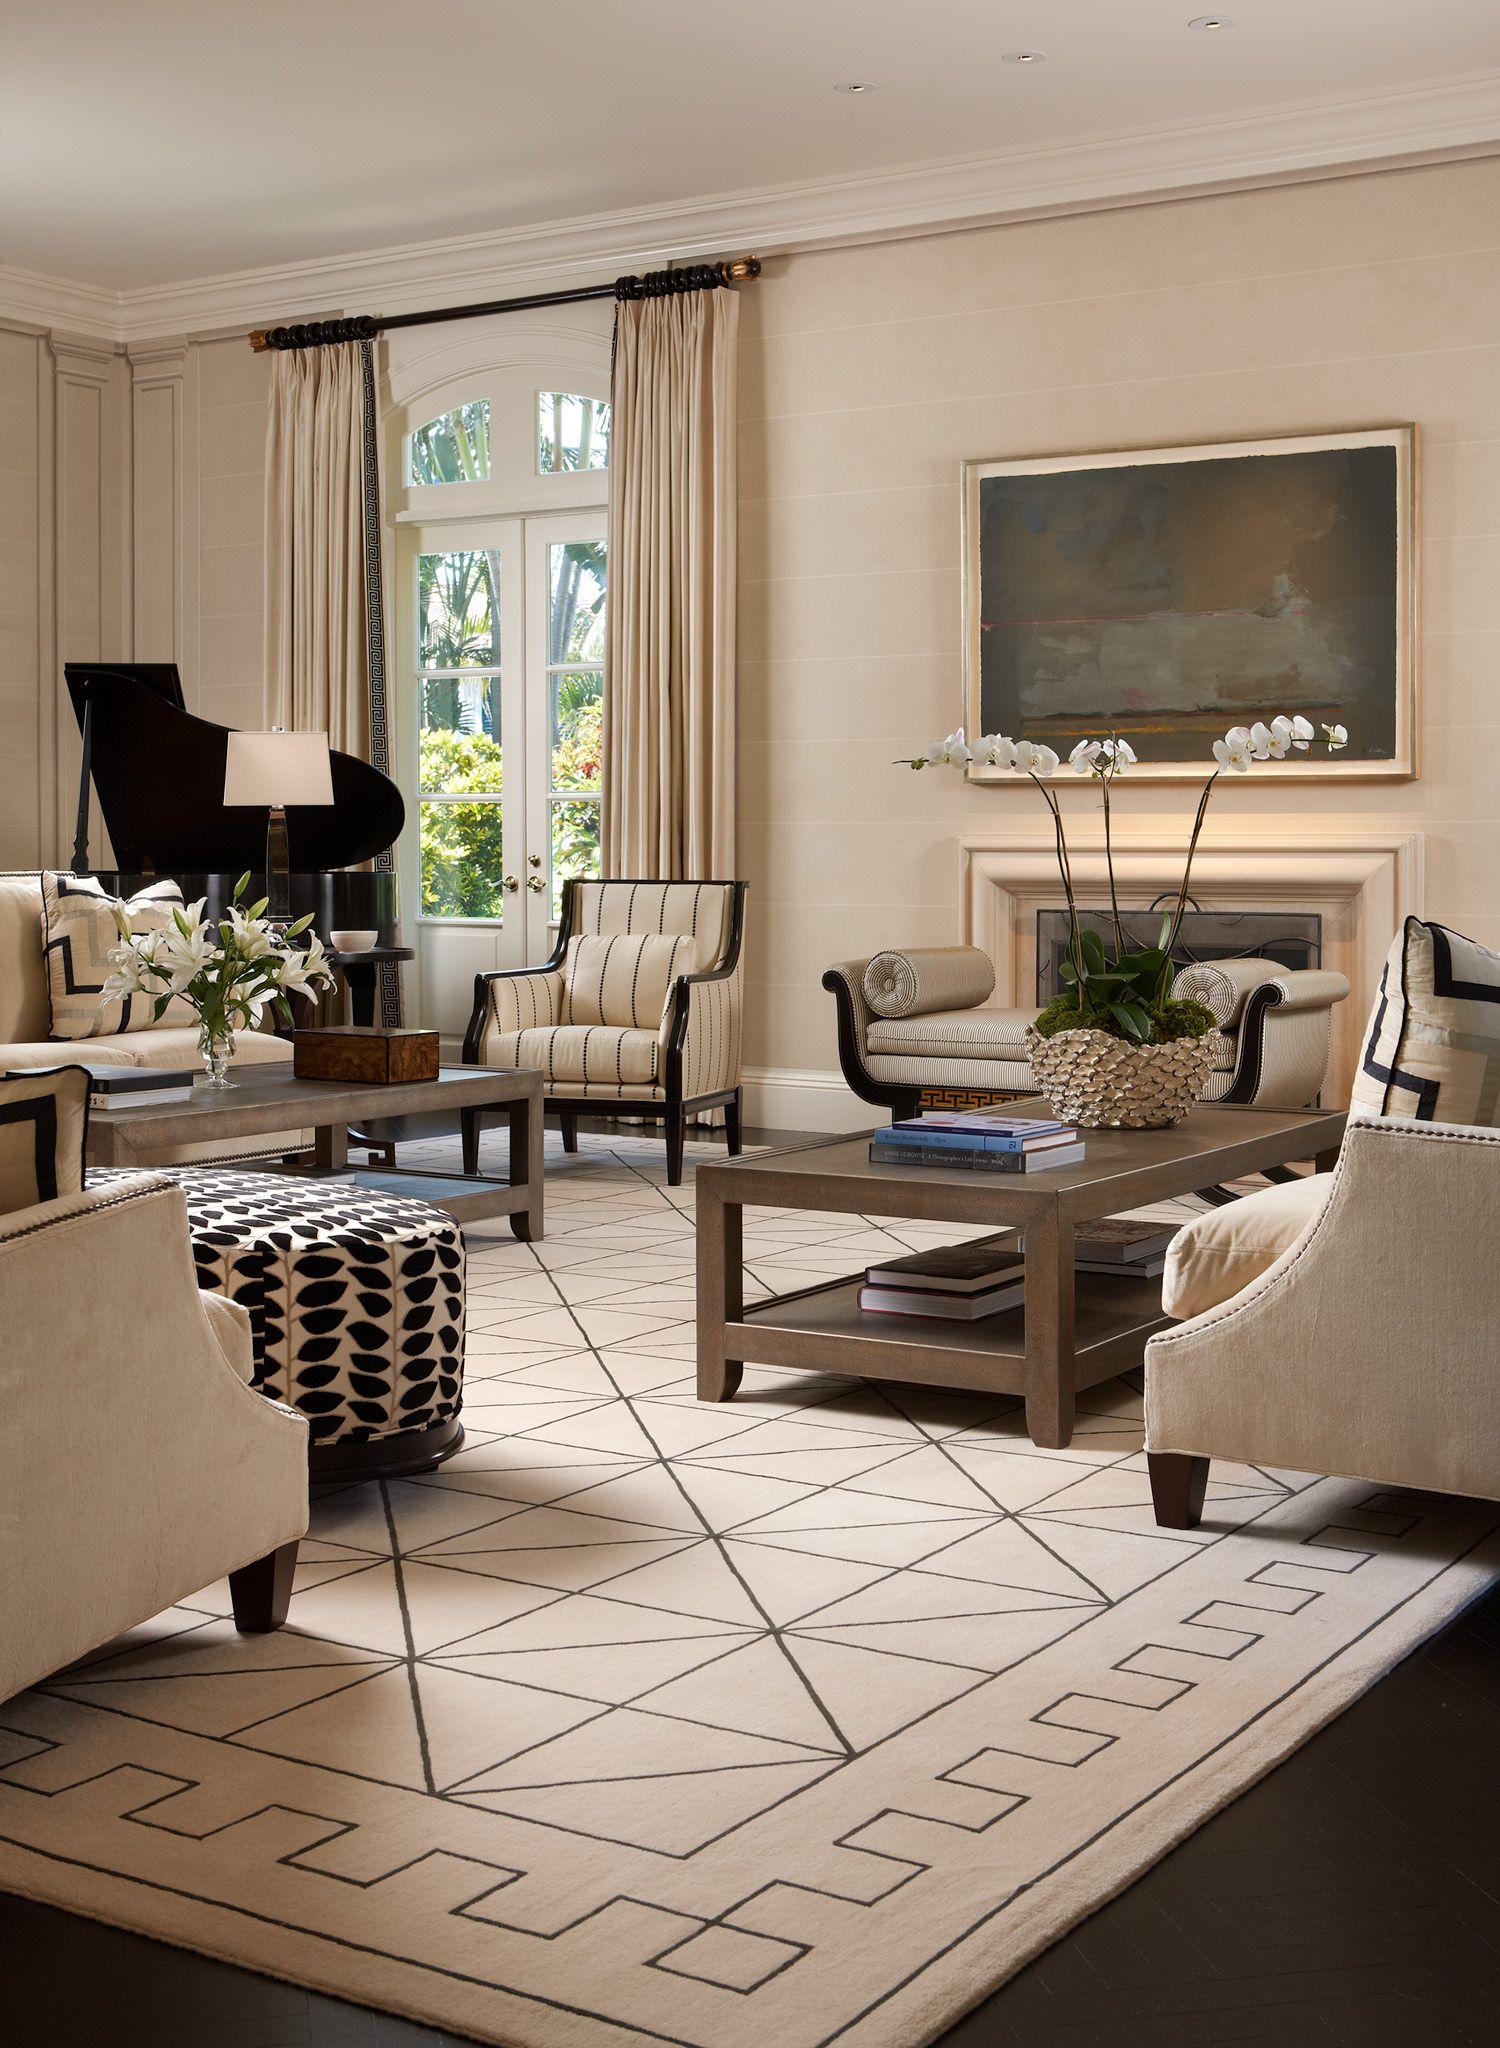 Palm Beach Interior Design Allison Paladino Interior Design #interiordesign  #palmbeachinteriors #palmbeach www.